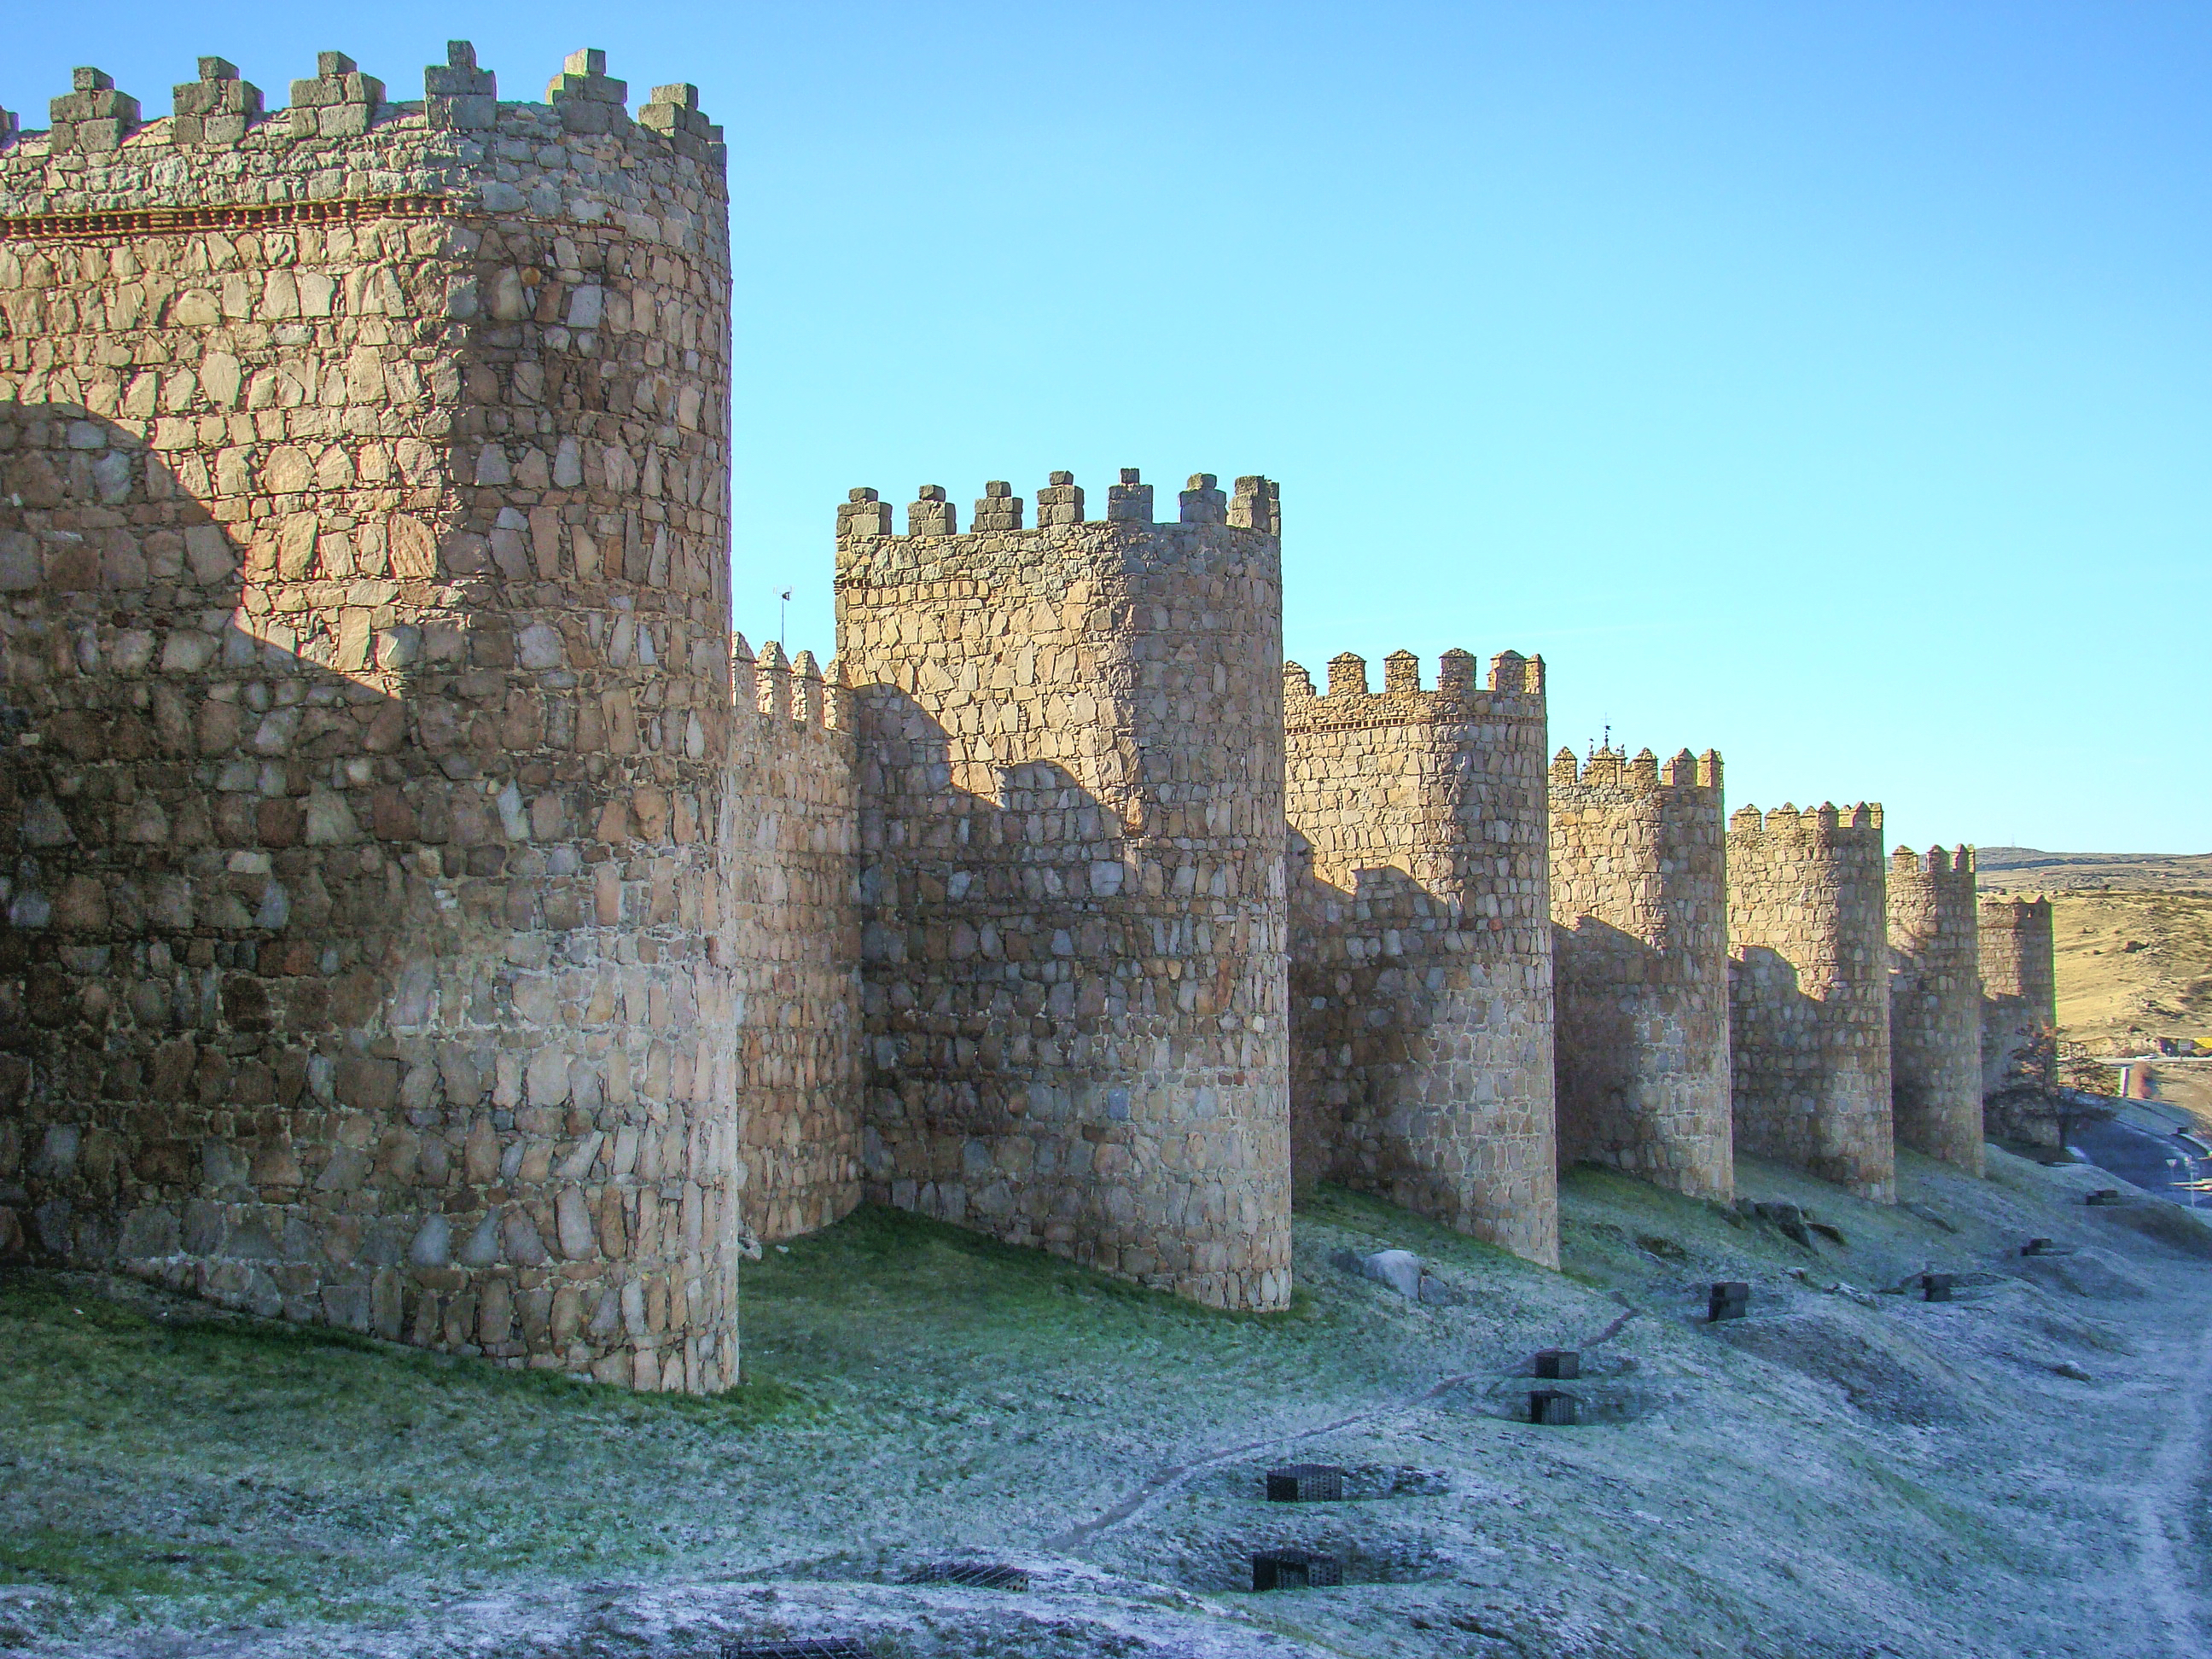 File:Avila murallas romanicas 01 ni.JPG